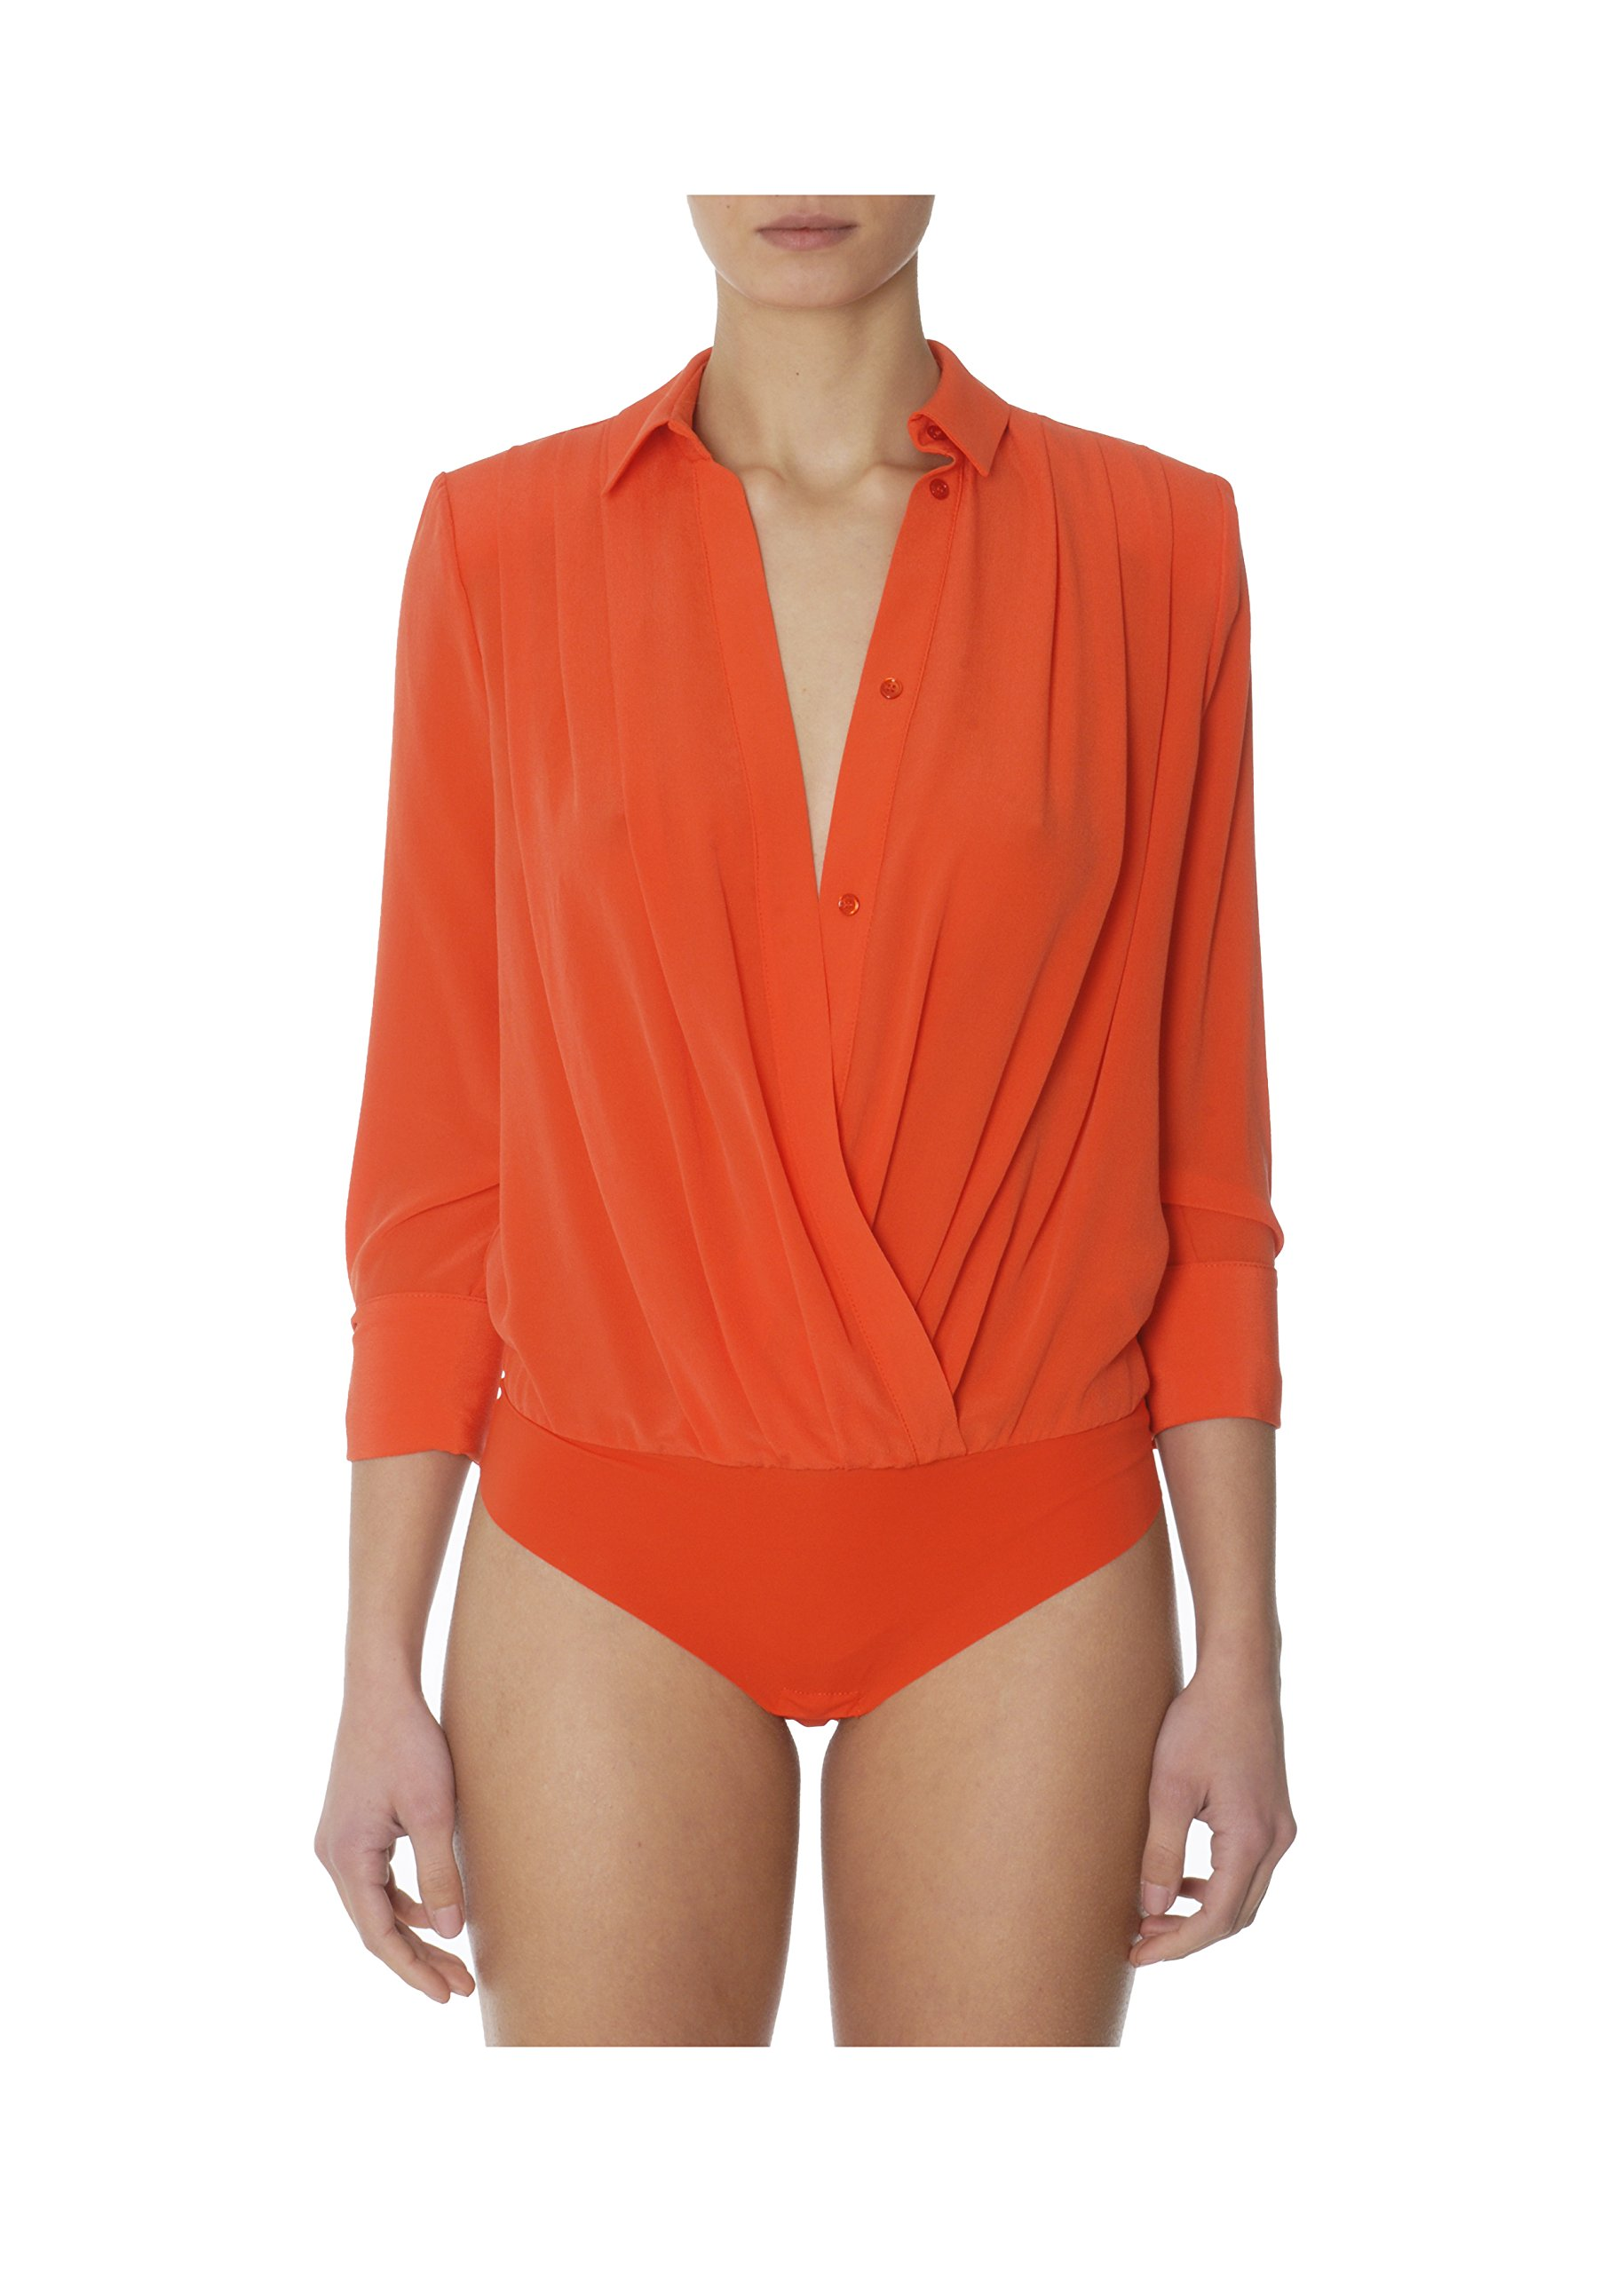 ELISABETTA FRANCHI Women's Bo7302914 Orange Silk Bodysuit